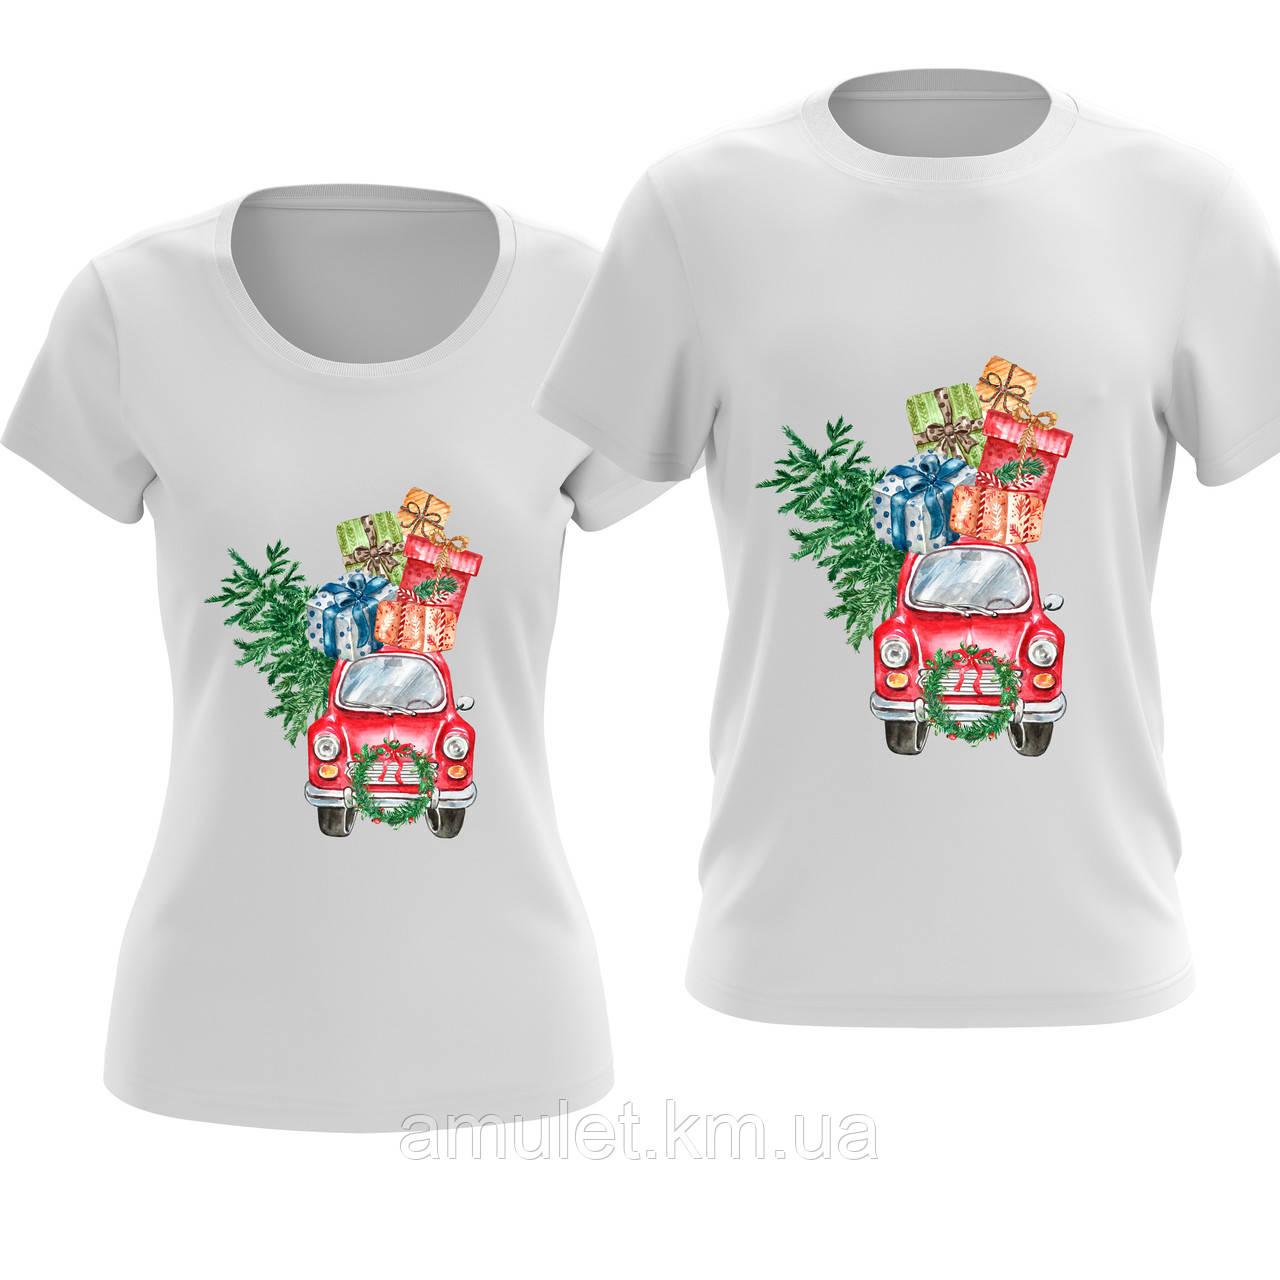 Парні футболки MERRY CHRISTMAS